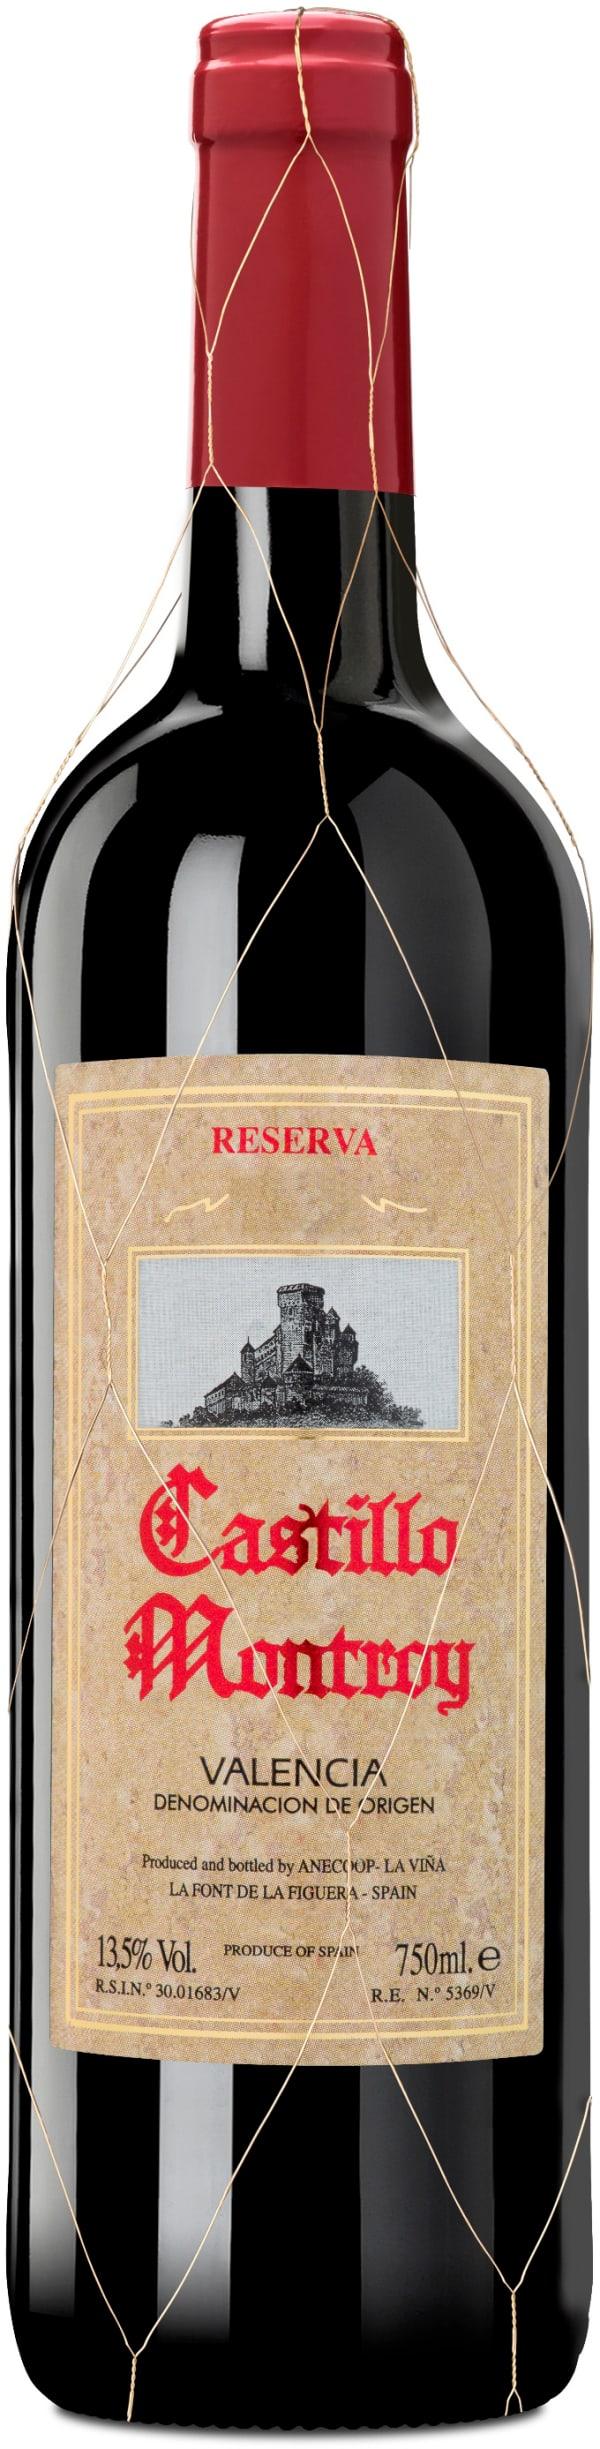 Castillo Montroy Reserva 2014